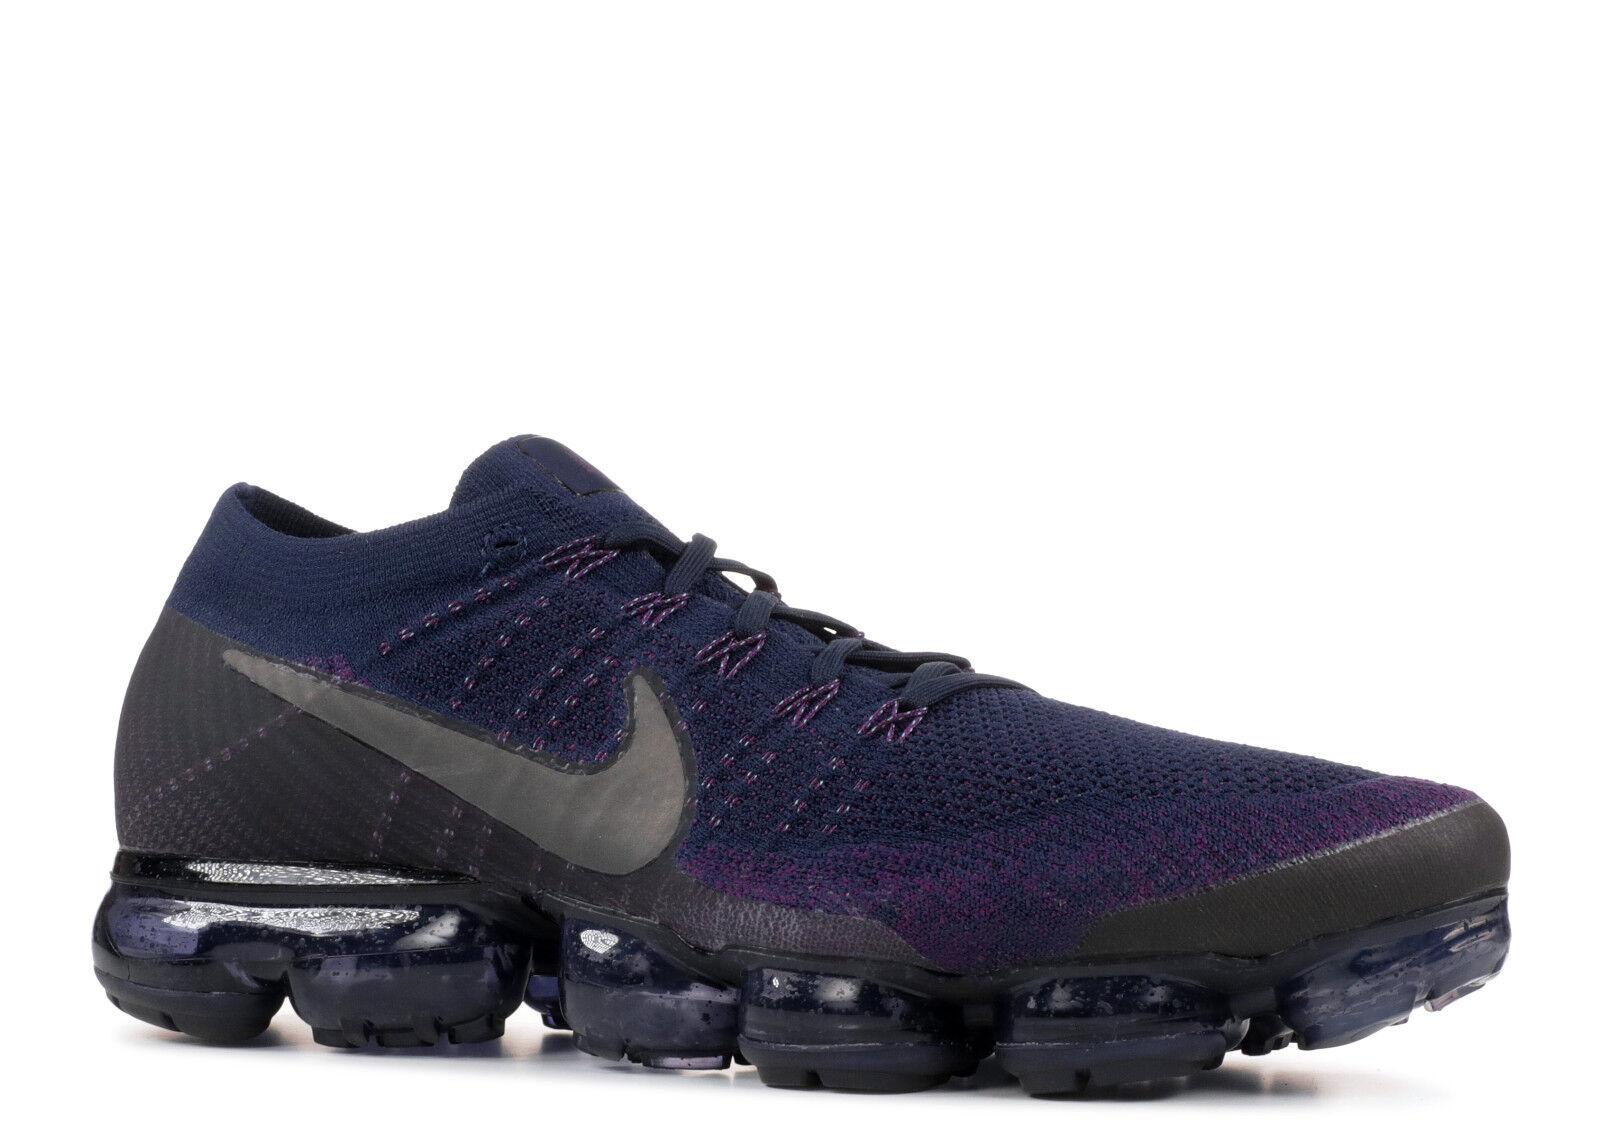 Nike Air Vapormax NikeLab QS Flyknit Purple Navy bluee Black 899473 402 Size 10.5